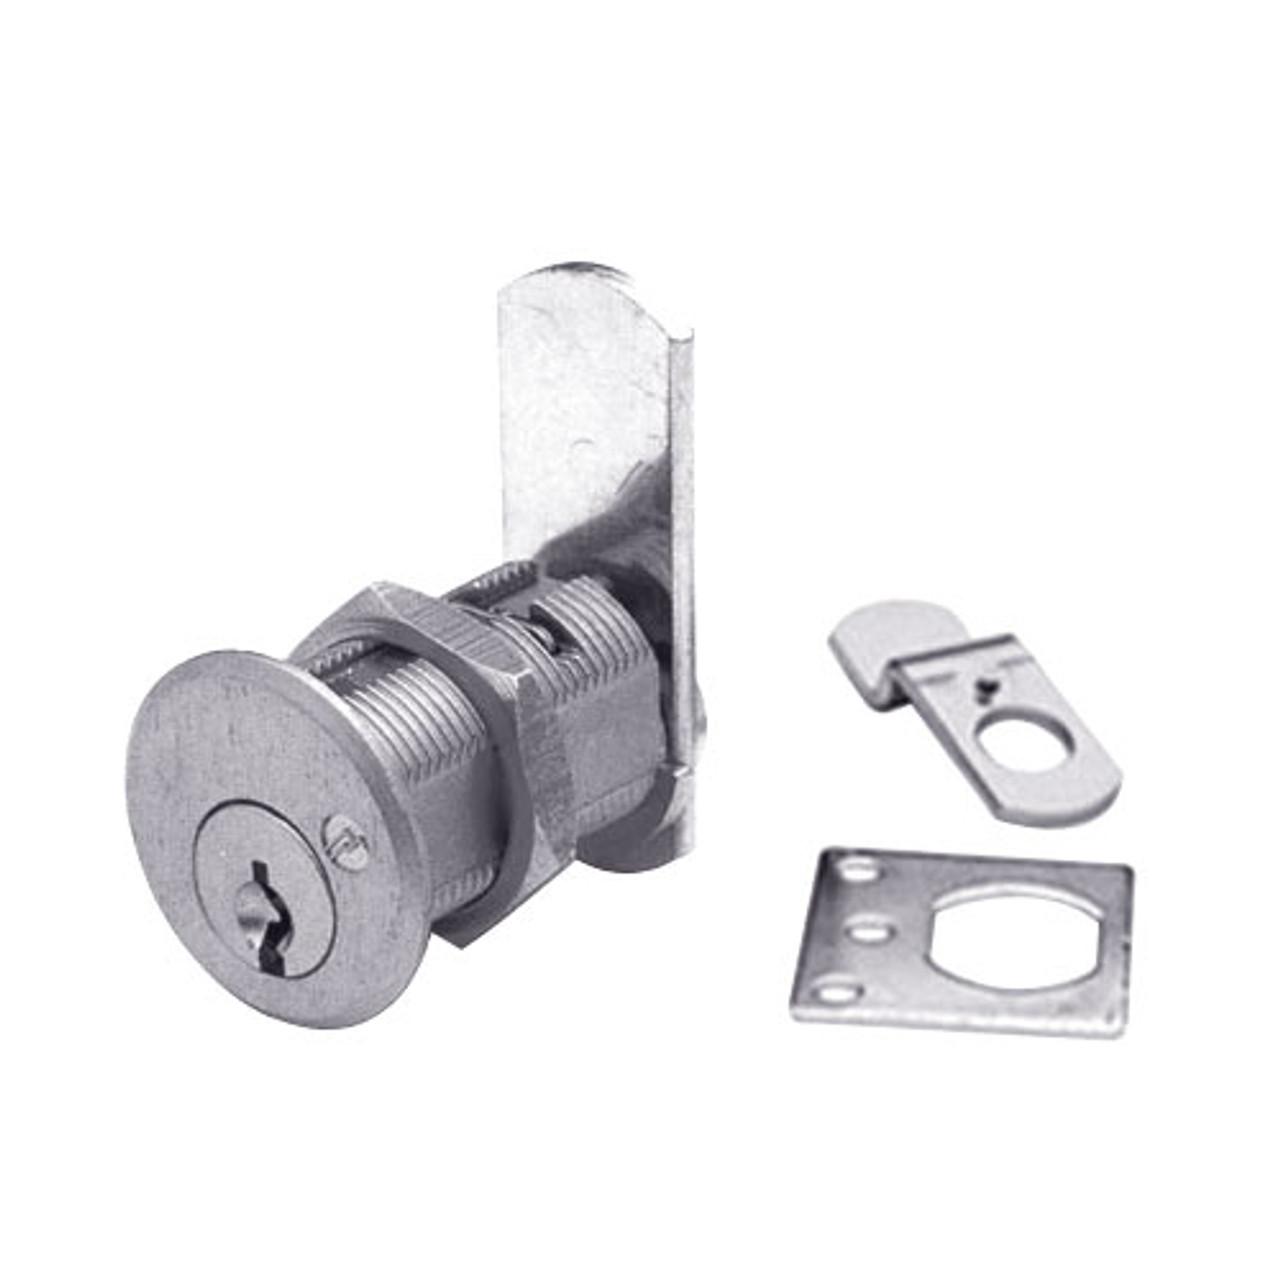 Olympus DCN1-KA103-26D Cam Locks in Satin Chrome Finish